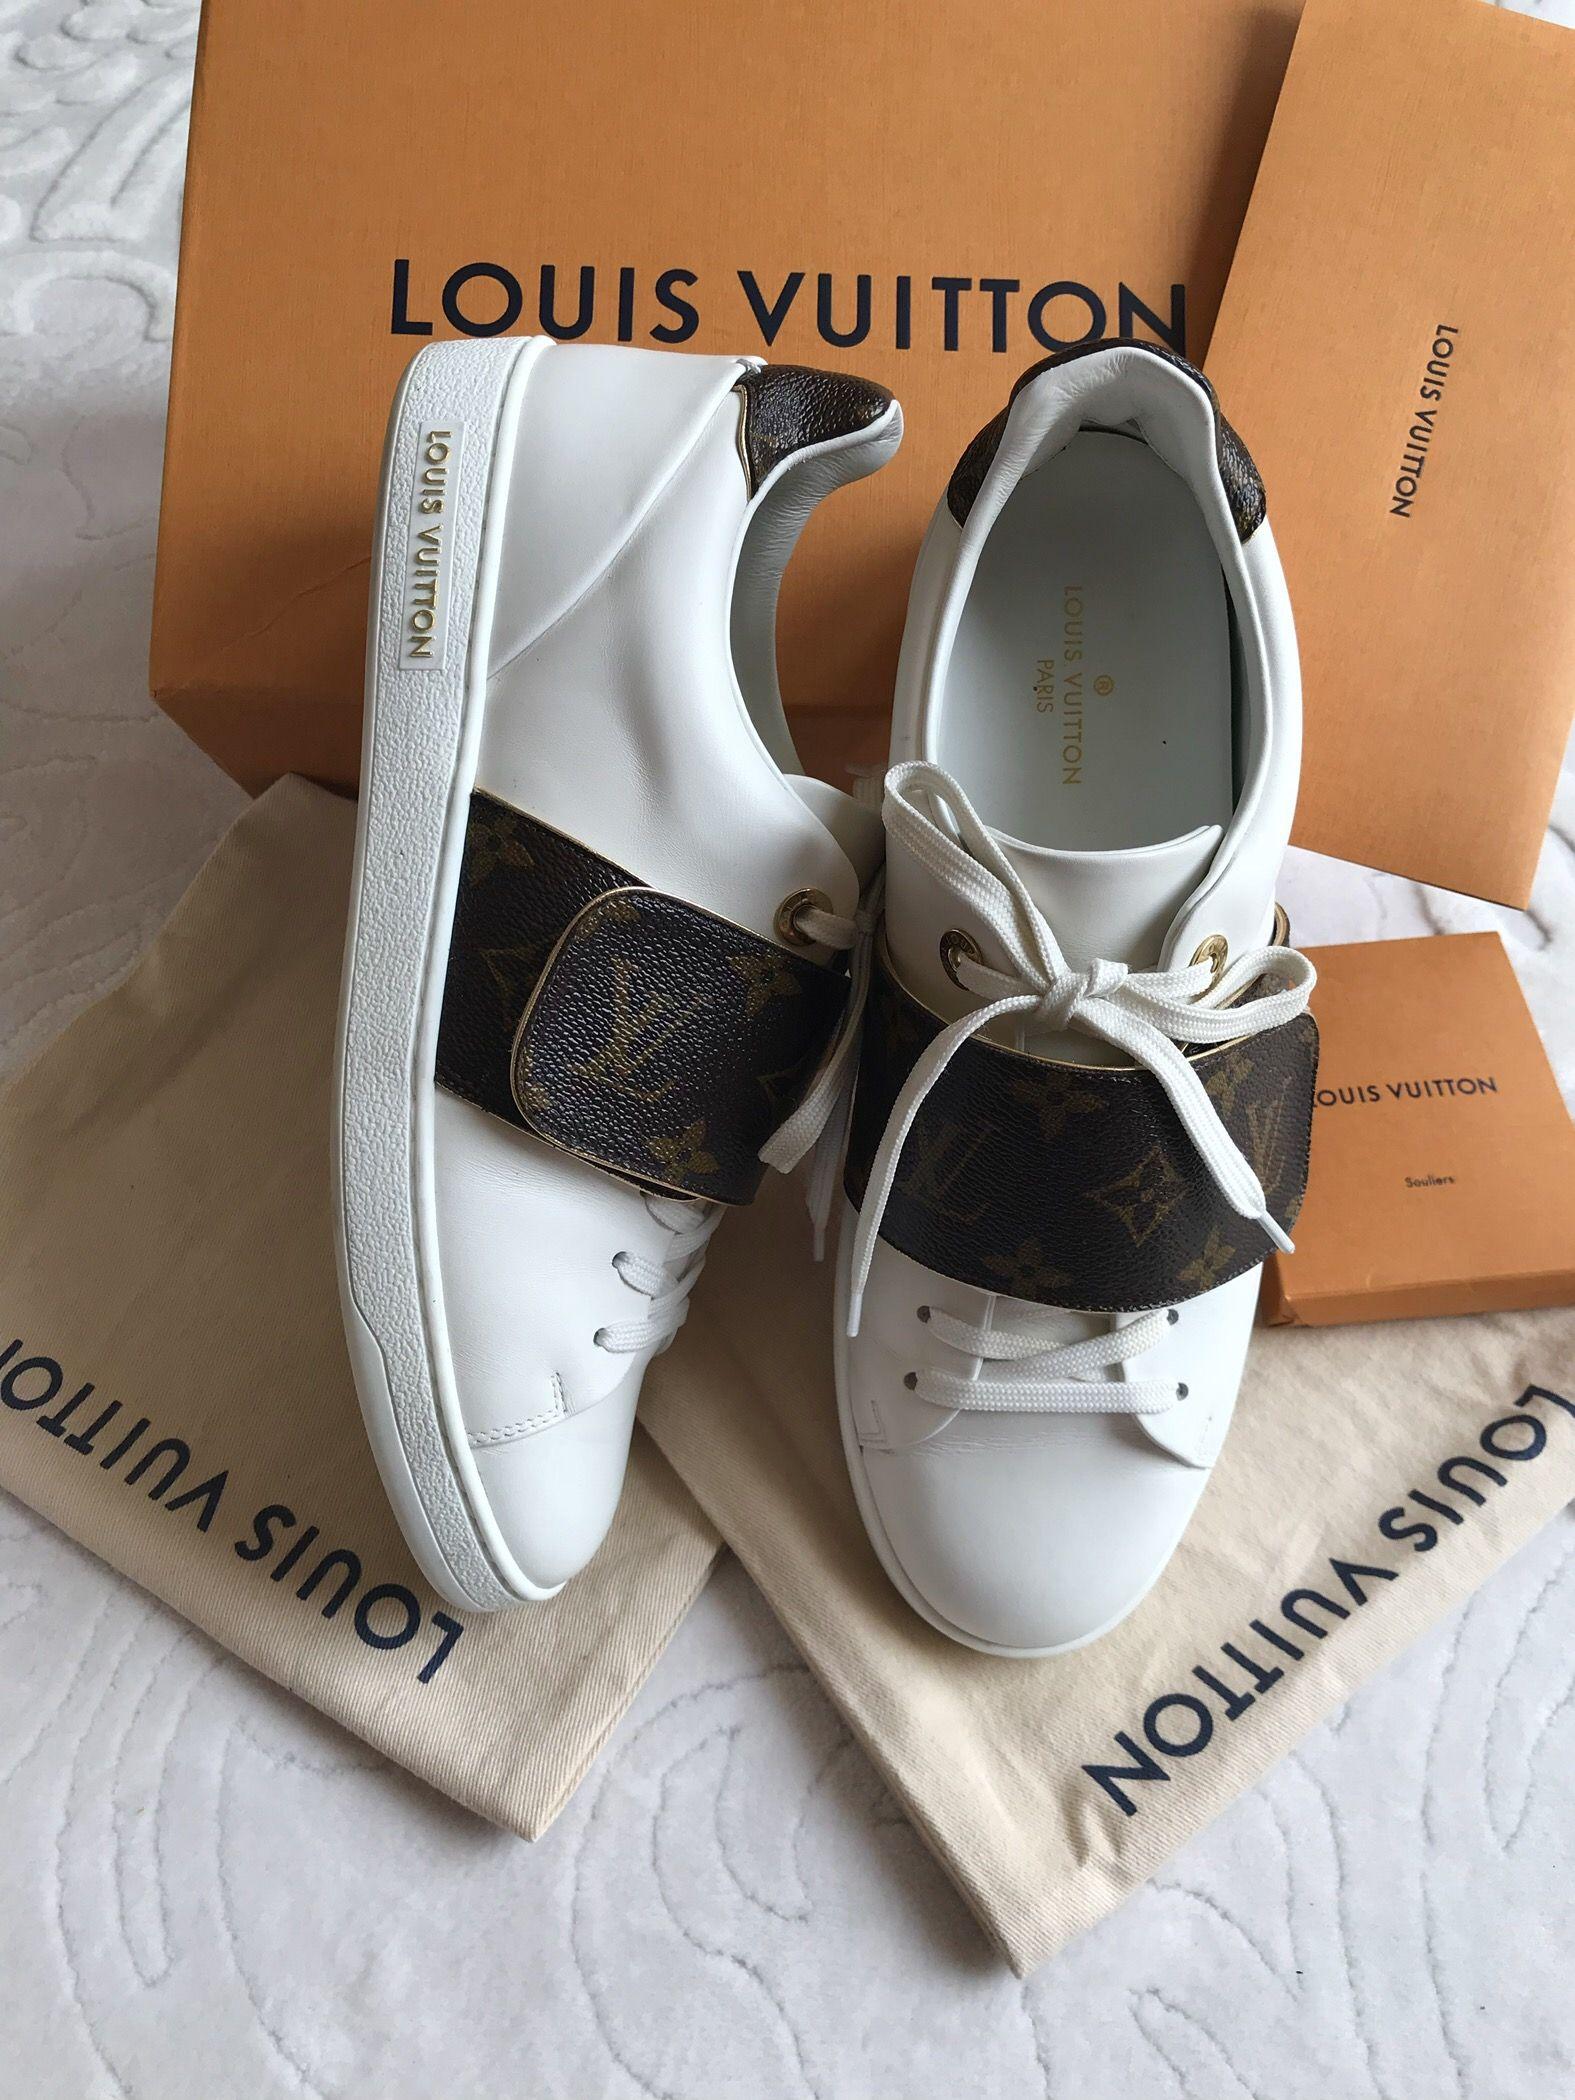 bdda42beee43 Louis Vuitton frontrow sneaker   Anzeige